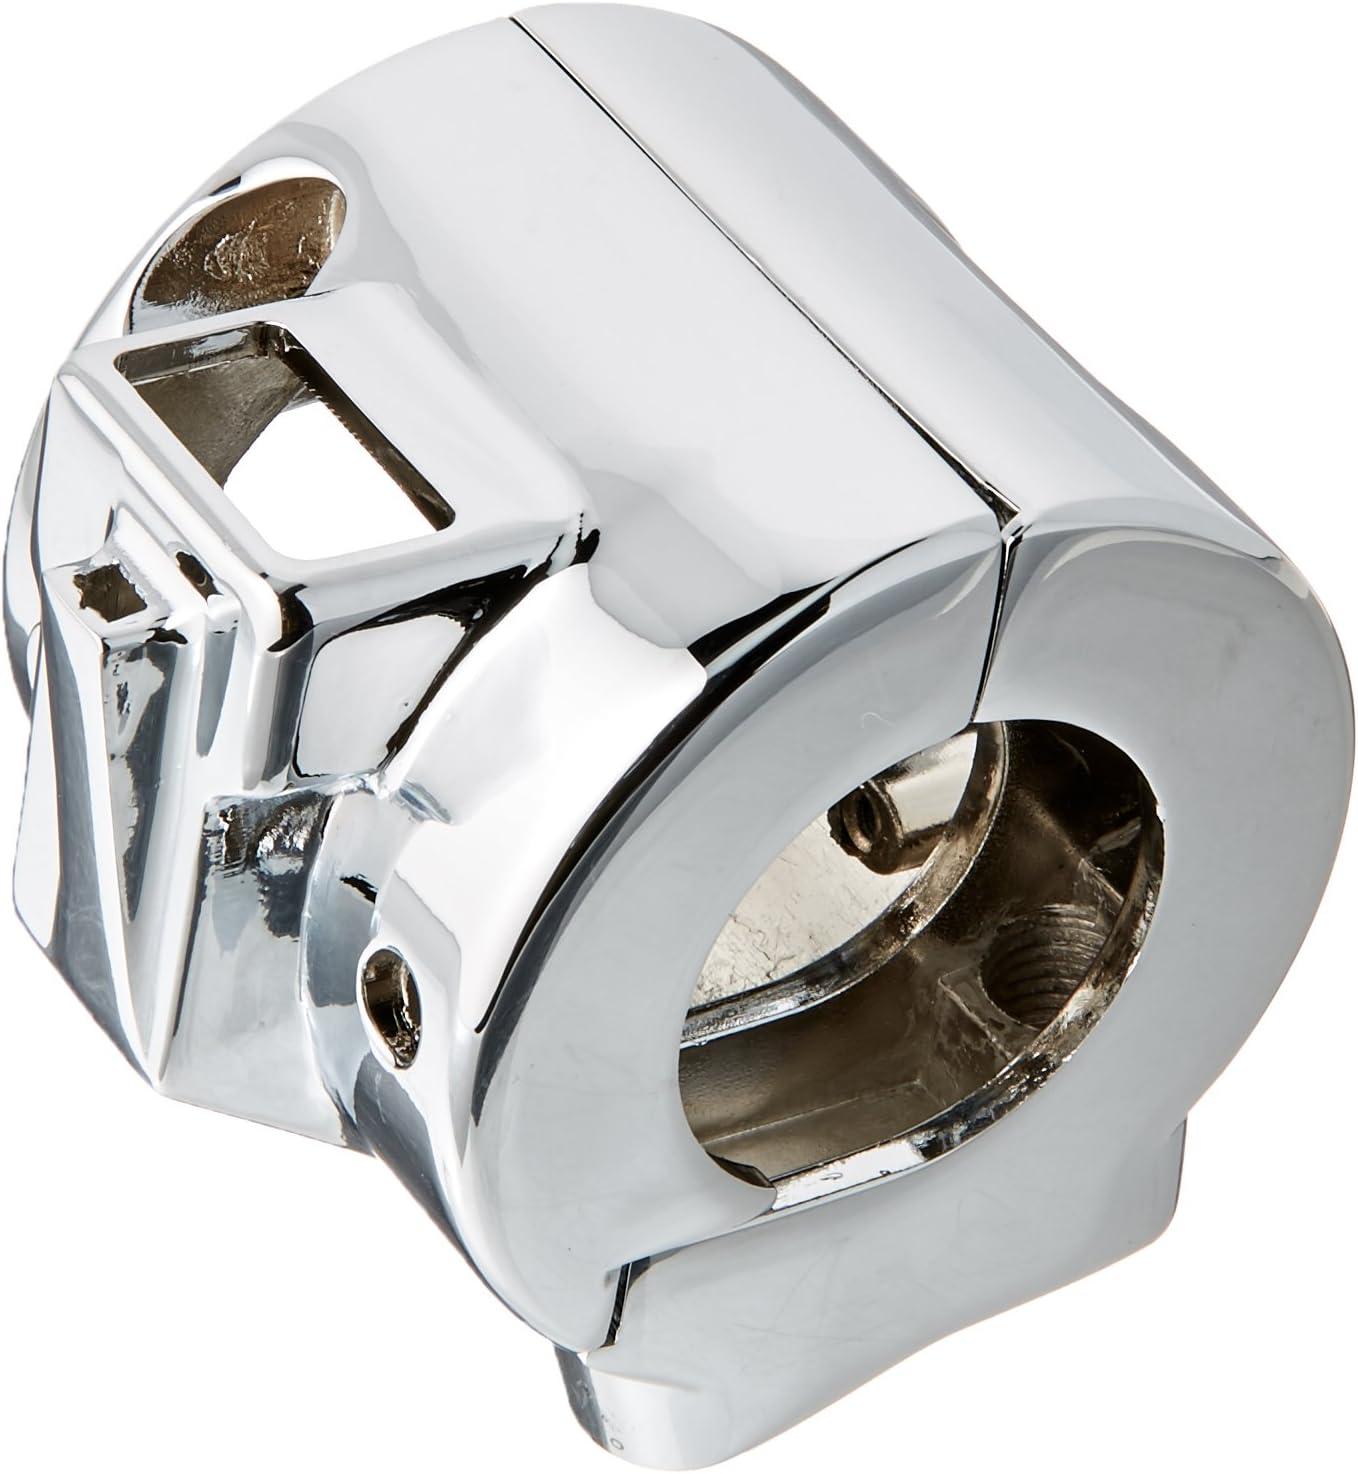 Show Chrome Accessories HOUSINGS RH 51-333B Max 4 years warranty 85% OFF H-BAR Sw